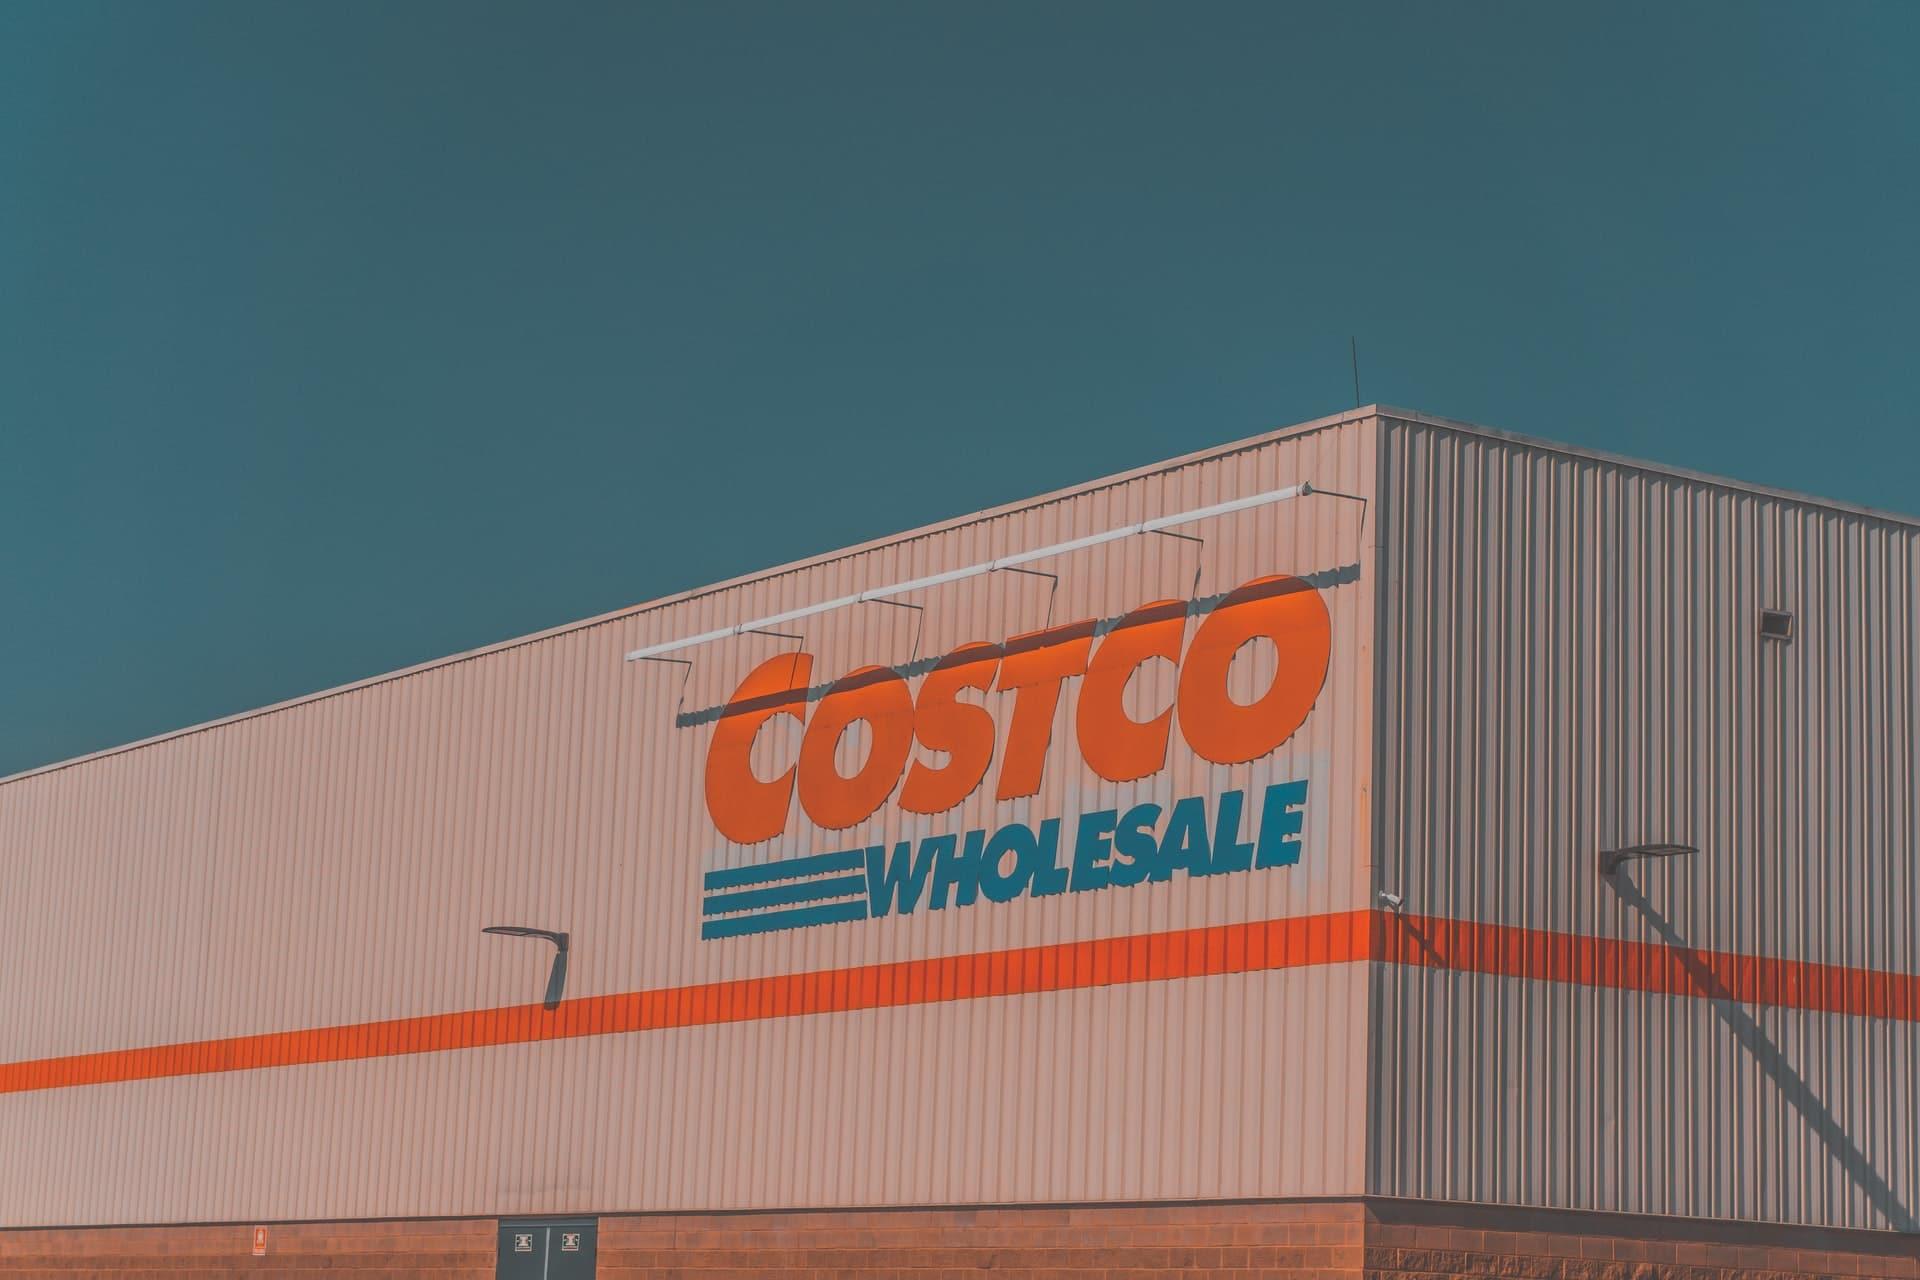 Free Costco Membership Discount